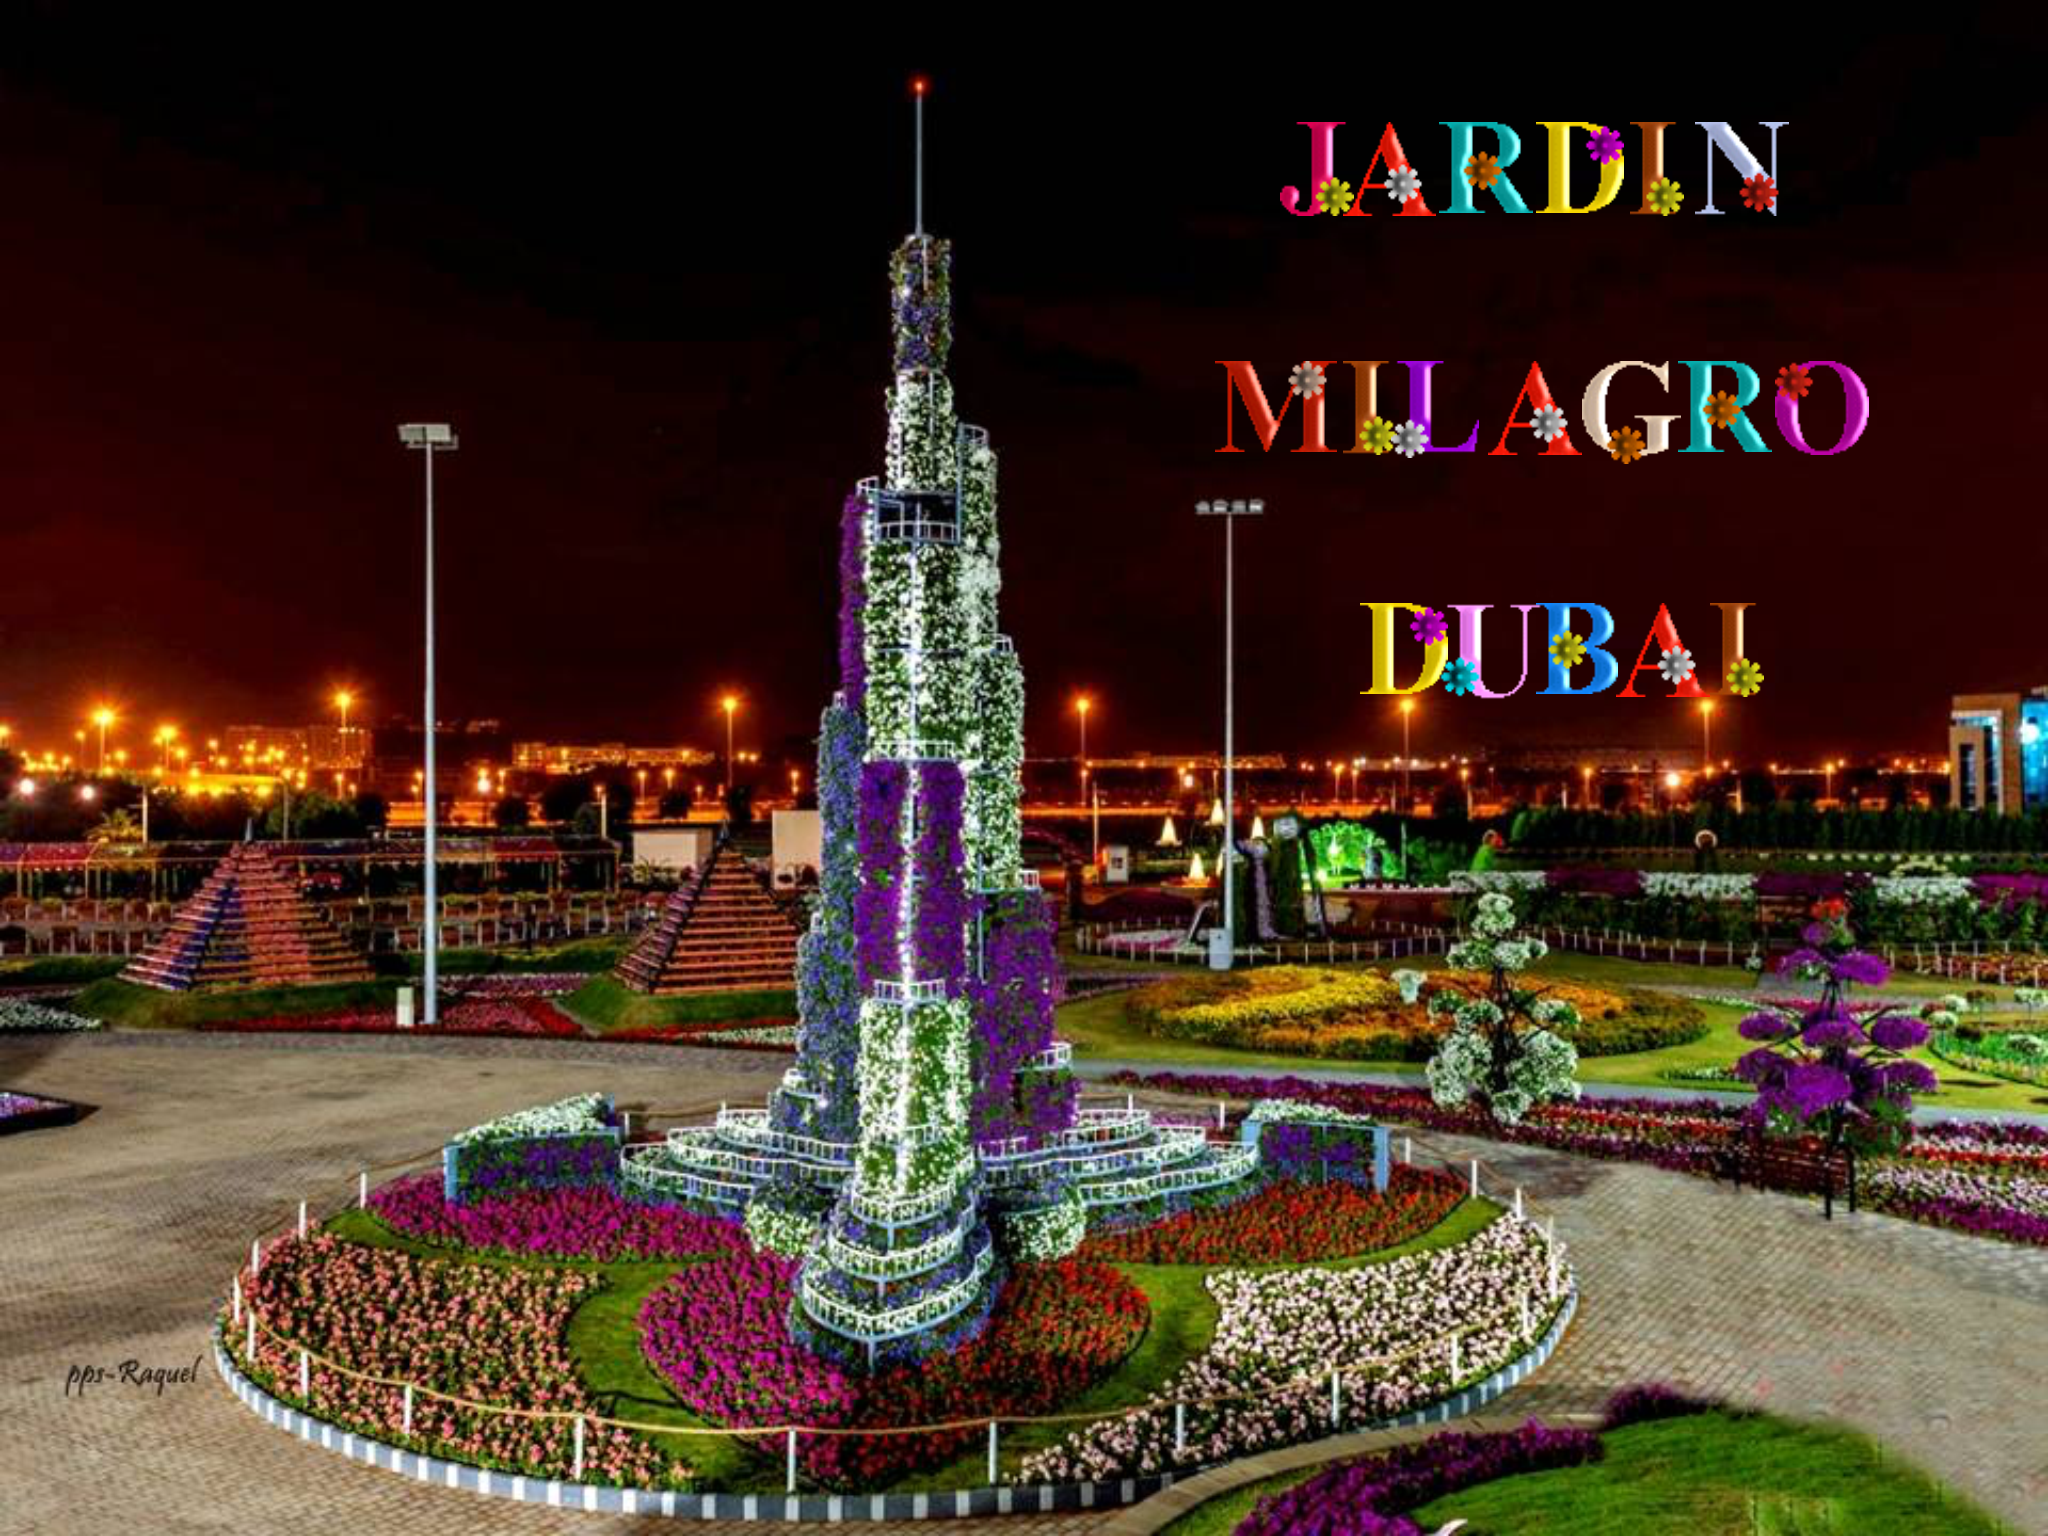 Miracle garden by Booguy on Dubaï Dubai garden